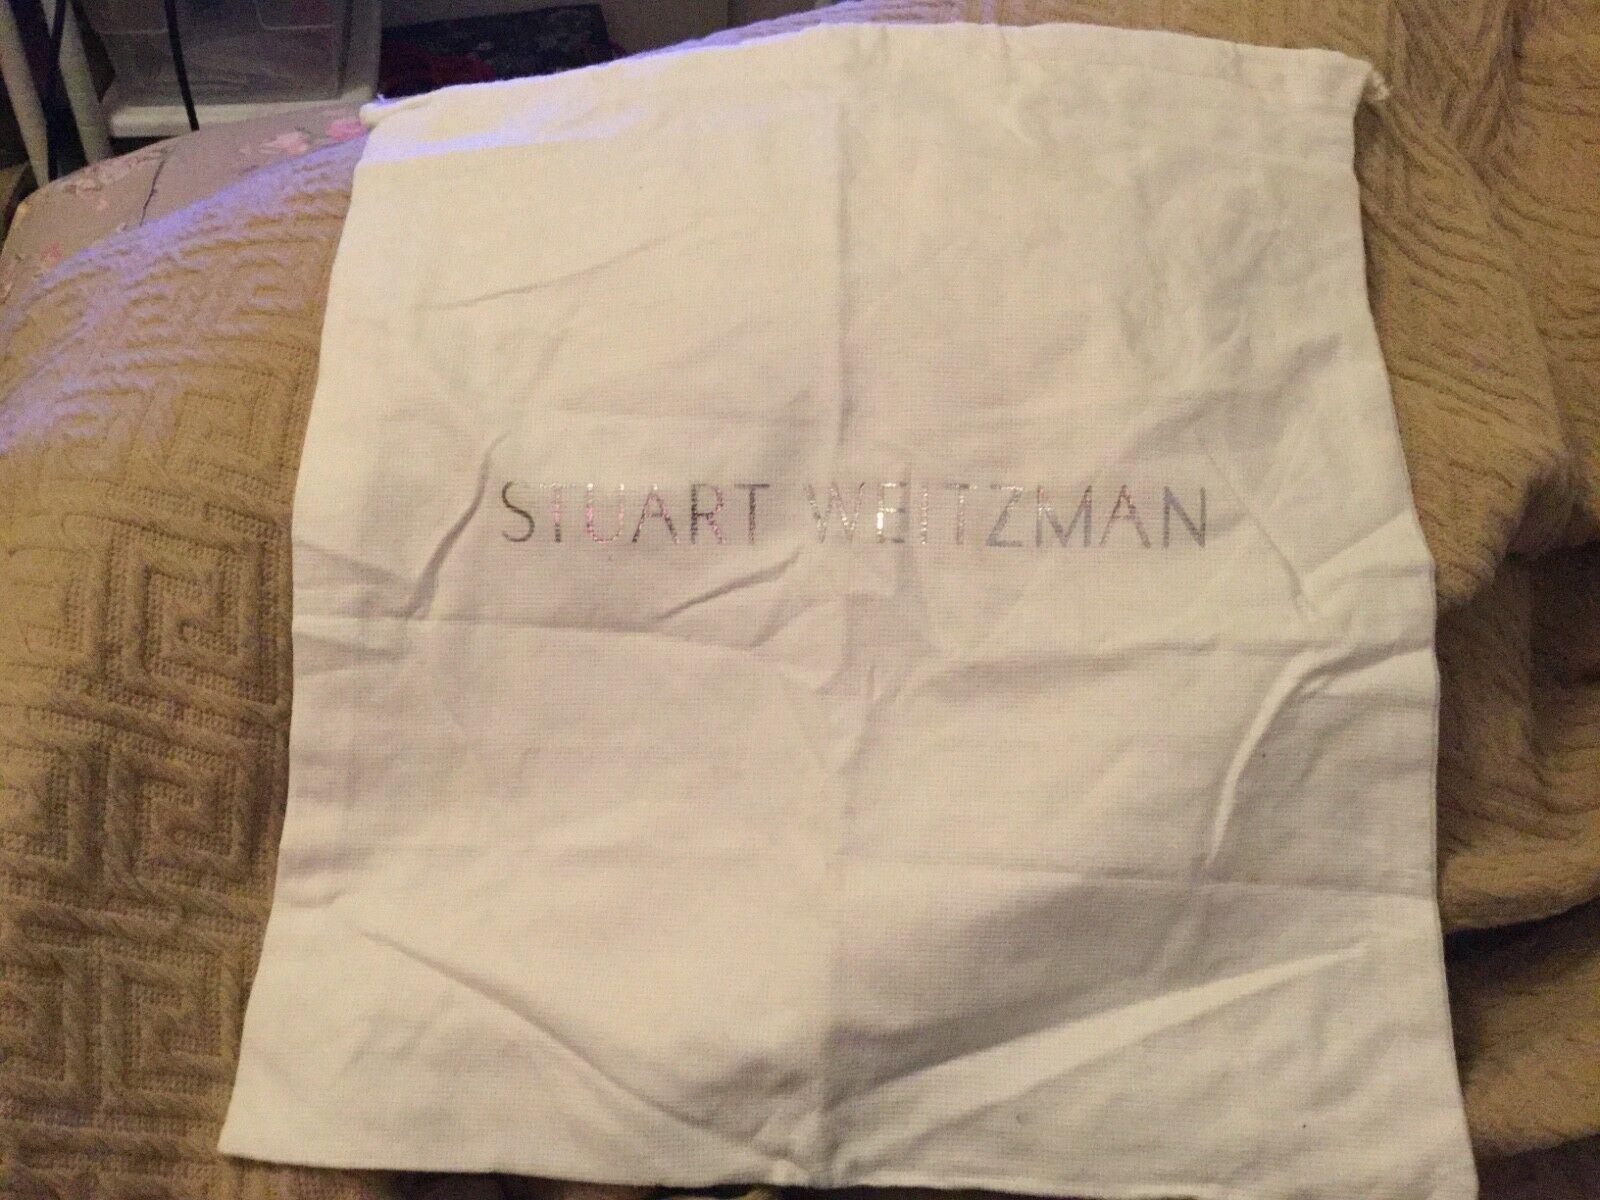 NEW STUART WEITZMAN DUST BAG WHITE WITH DRAWSTRING  14 x 15 - $7.22